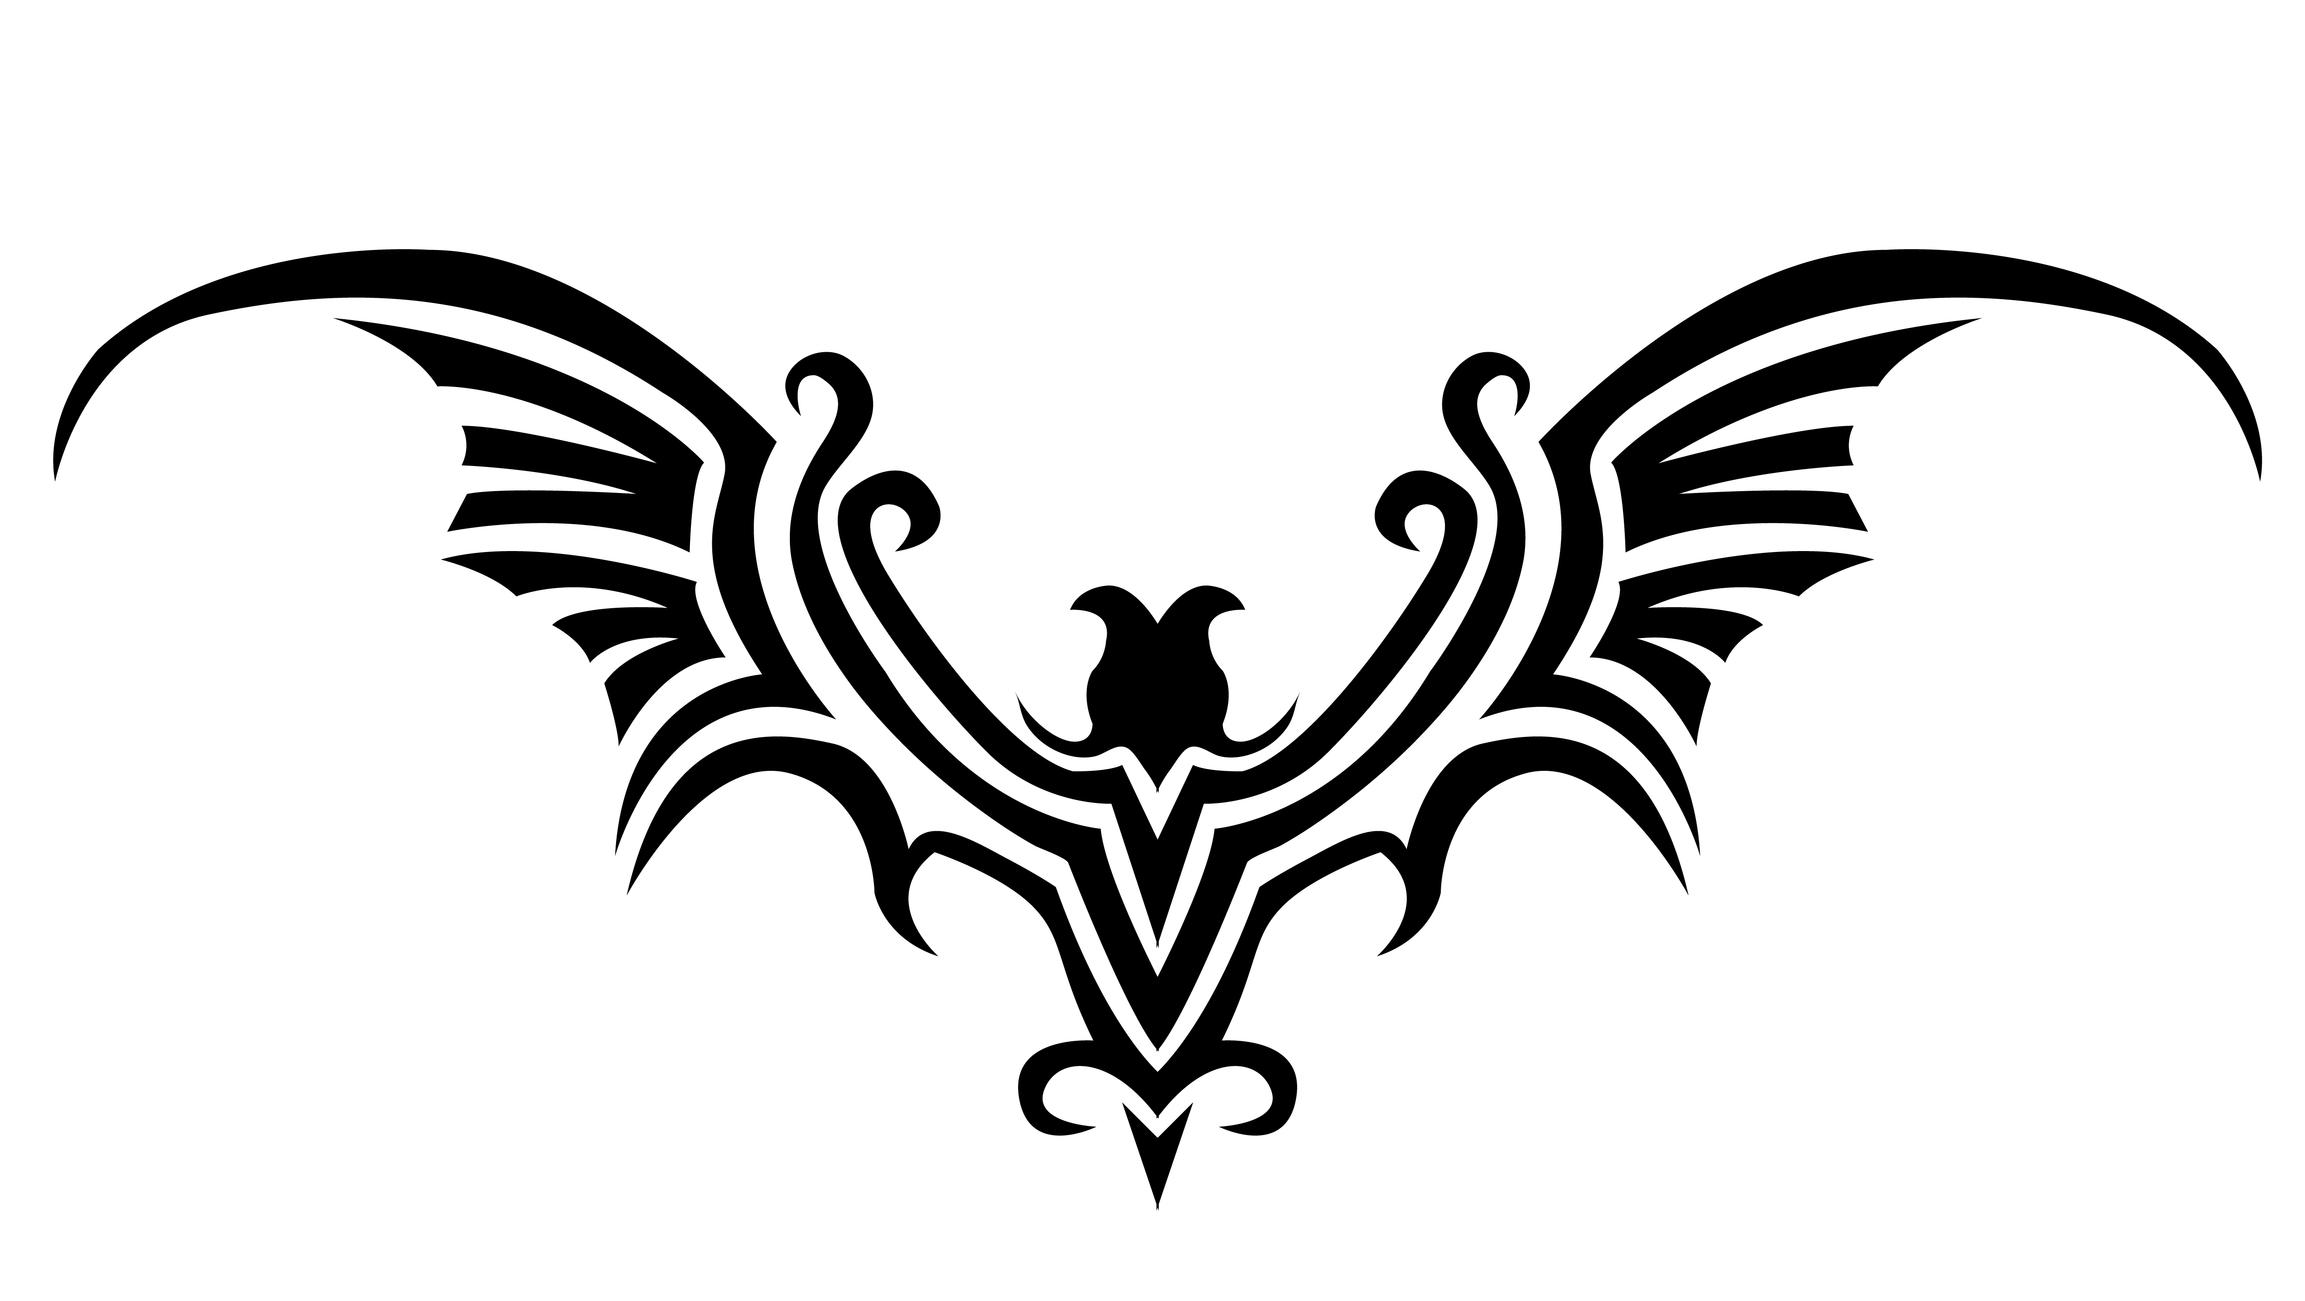 Gothic Heart Tattoos Gothic bat tattoo design